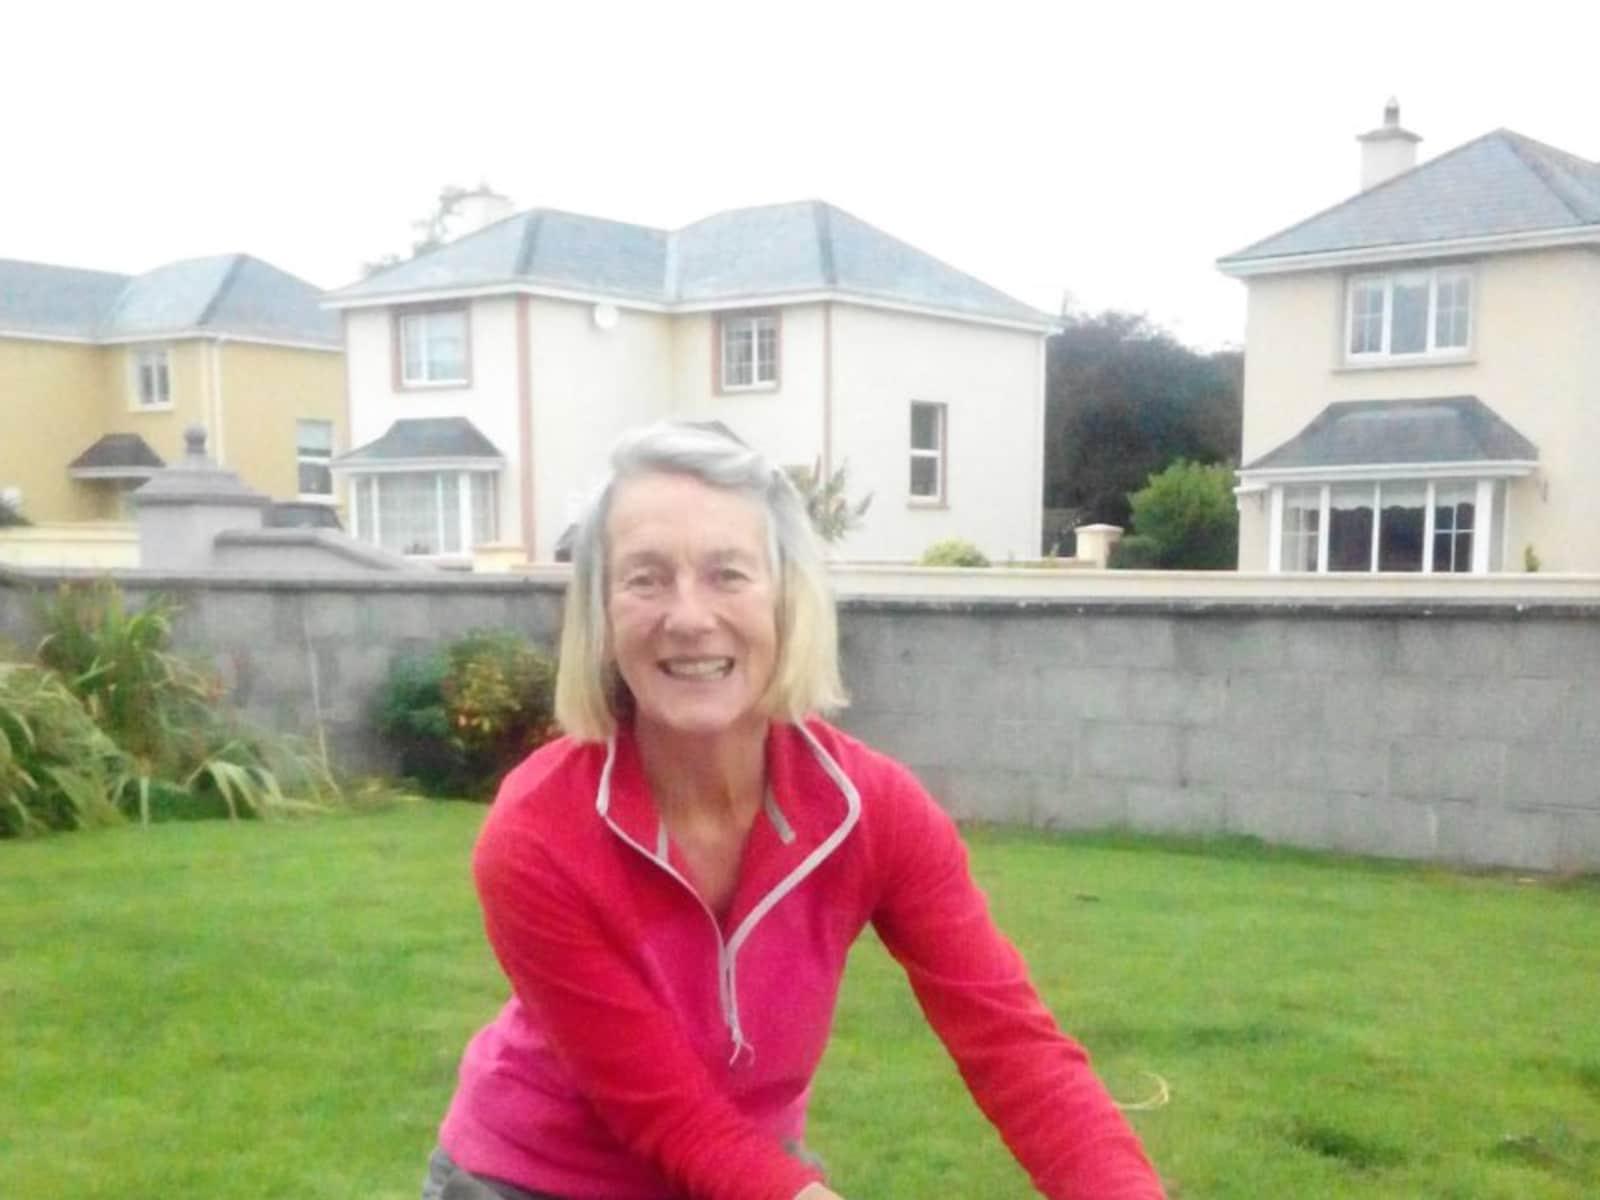 Mgt from Greenane, Ireland